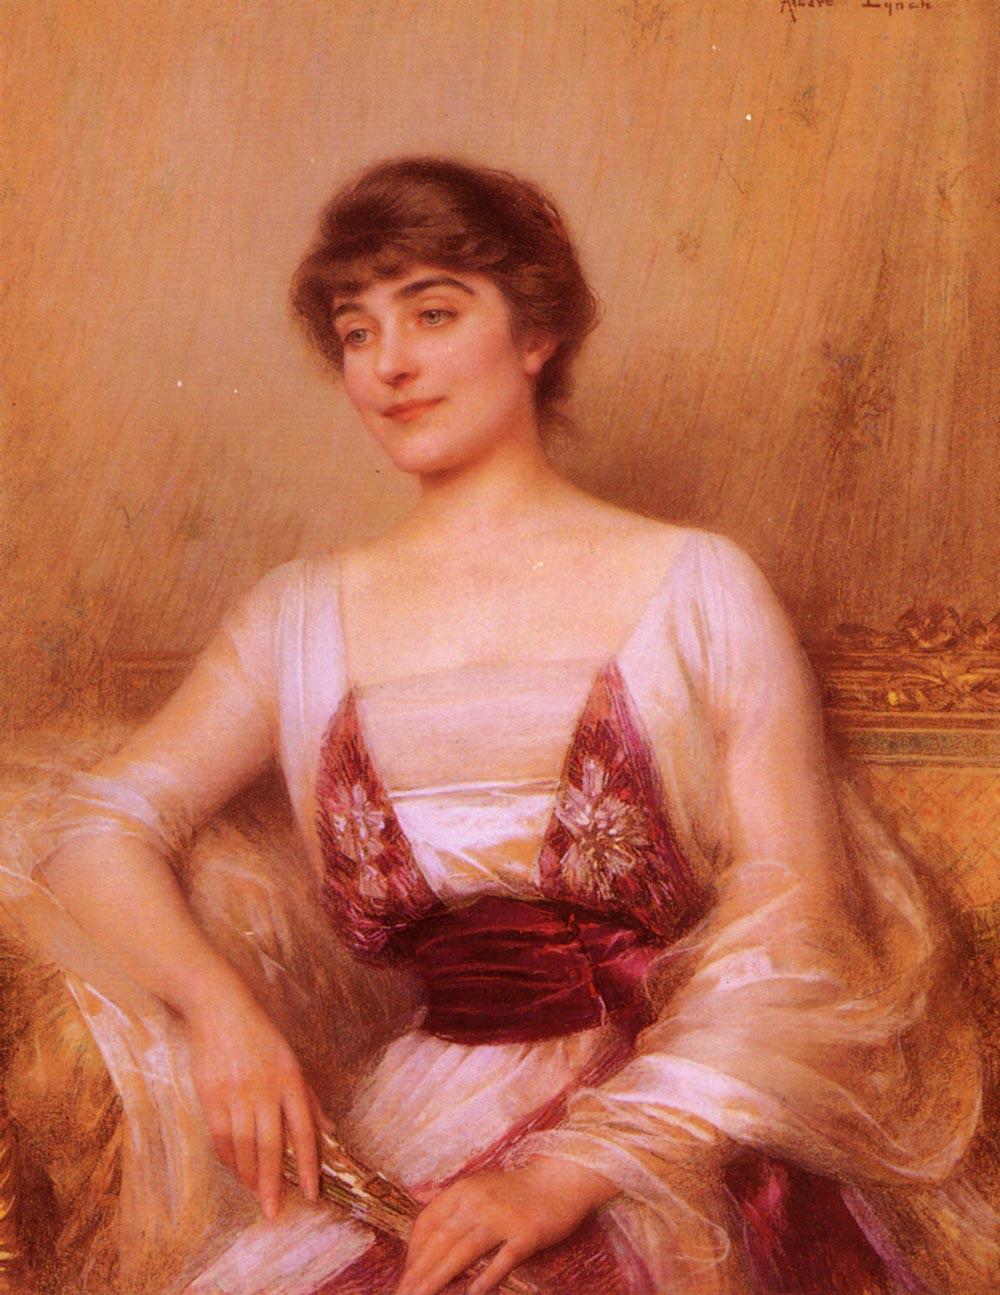 A Lady With a Fan by Albert Lynch